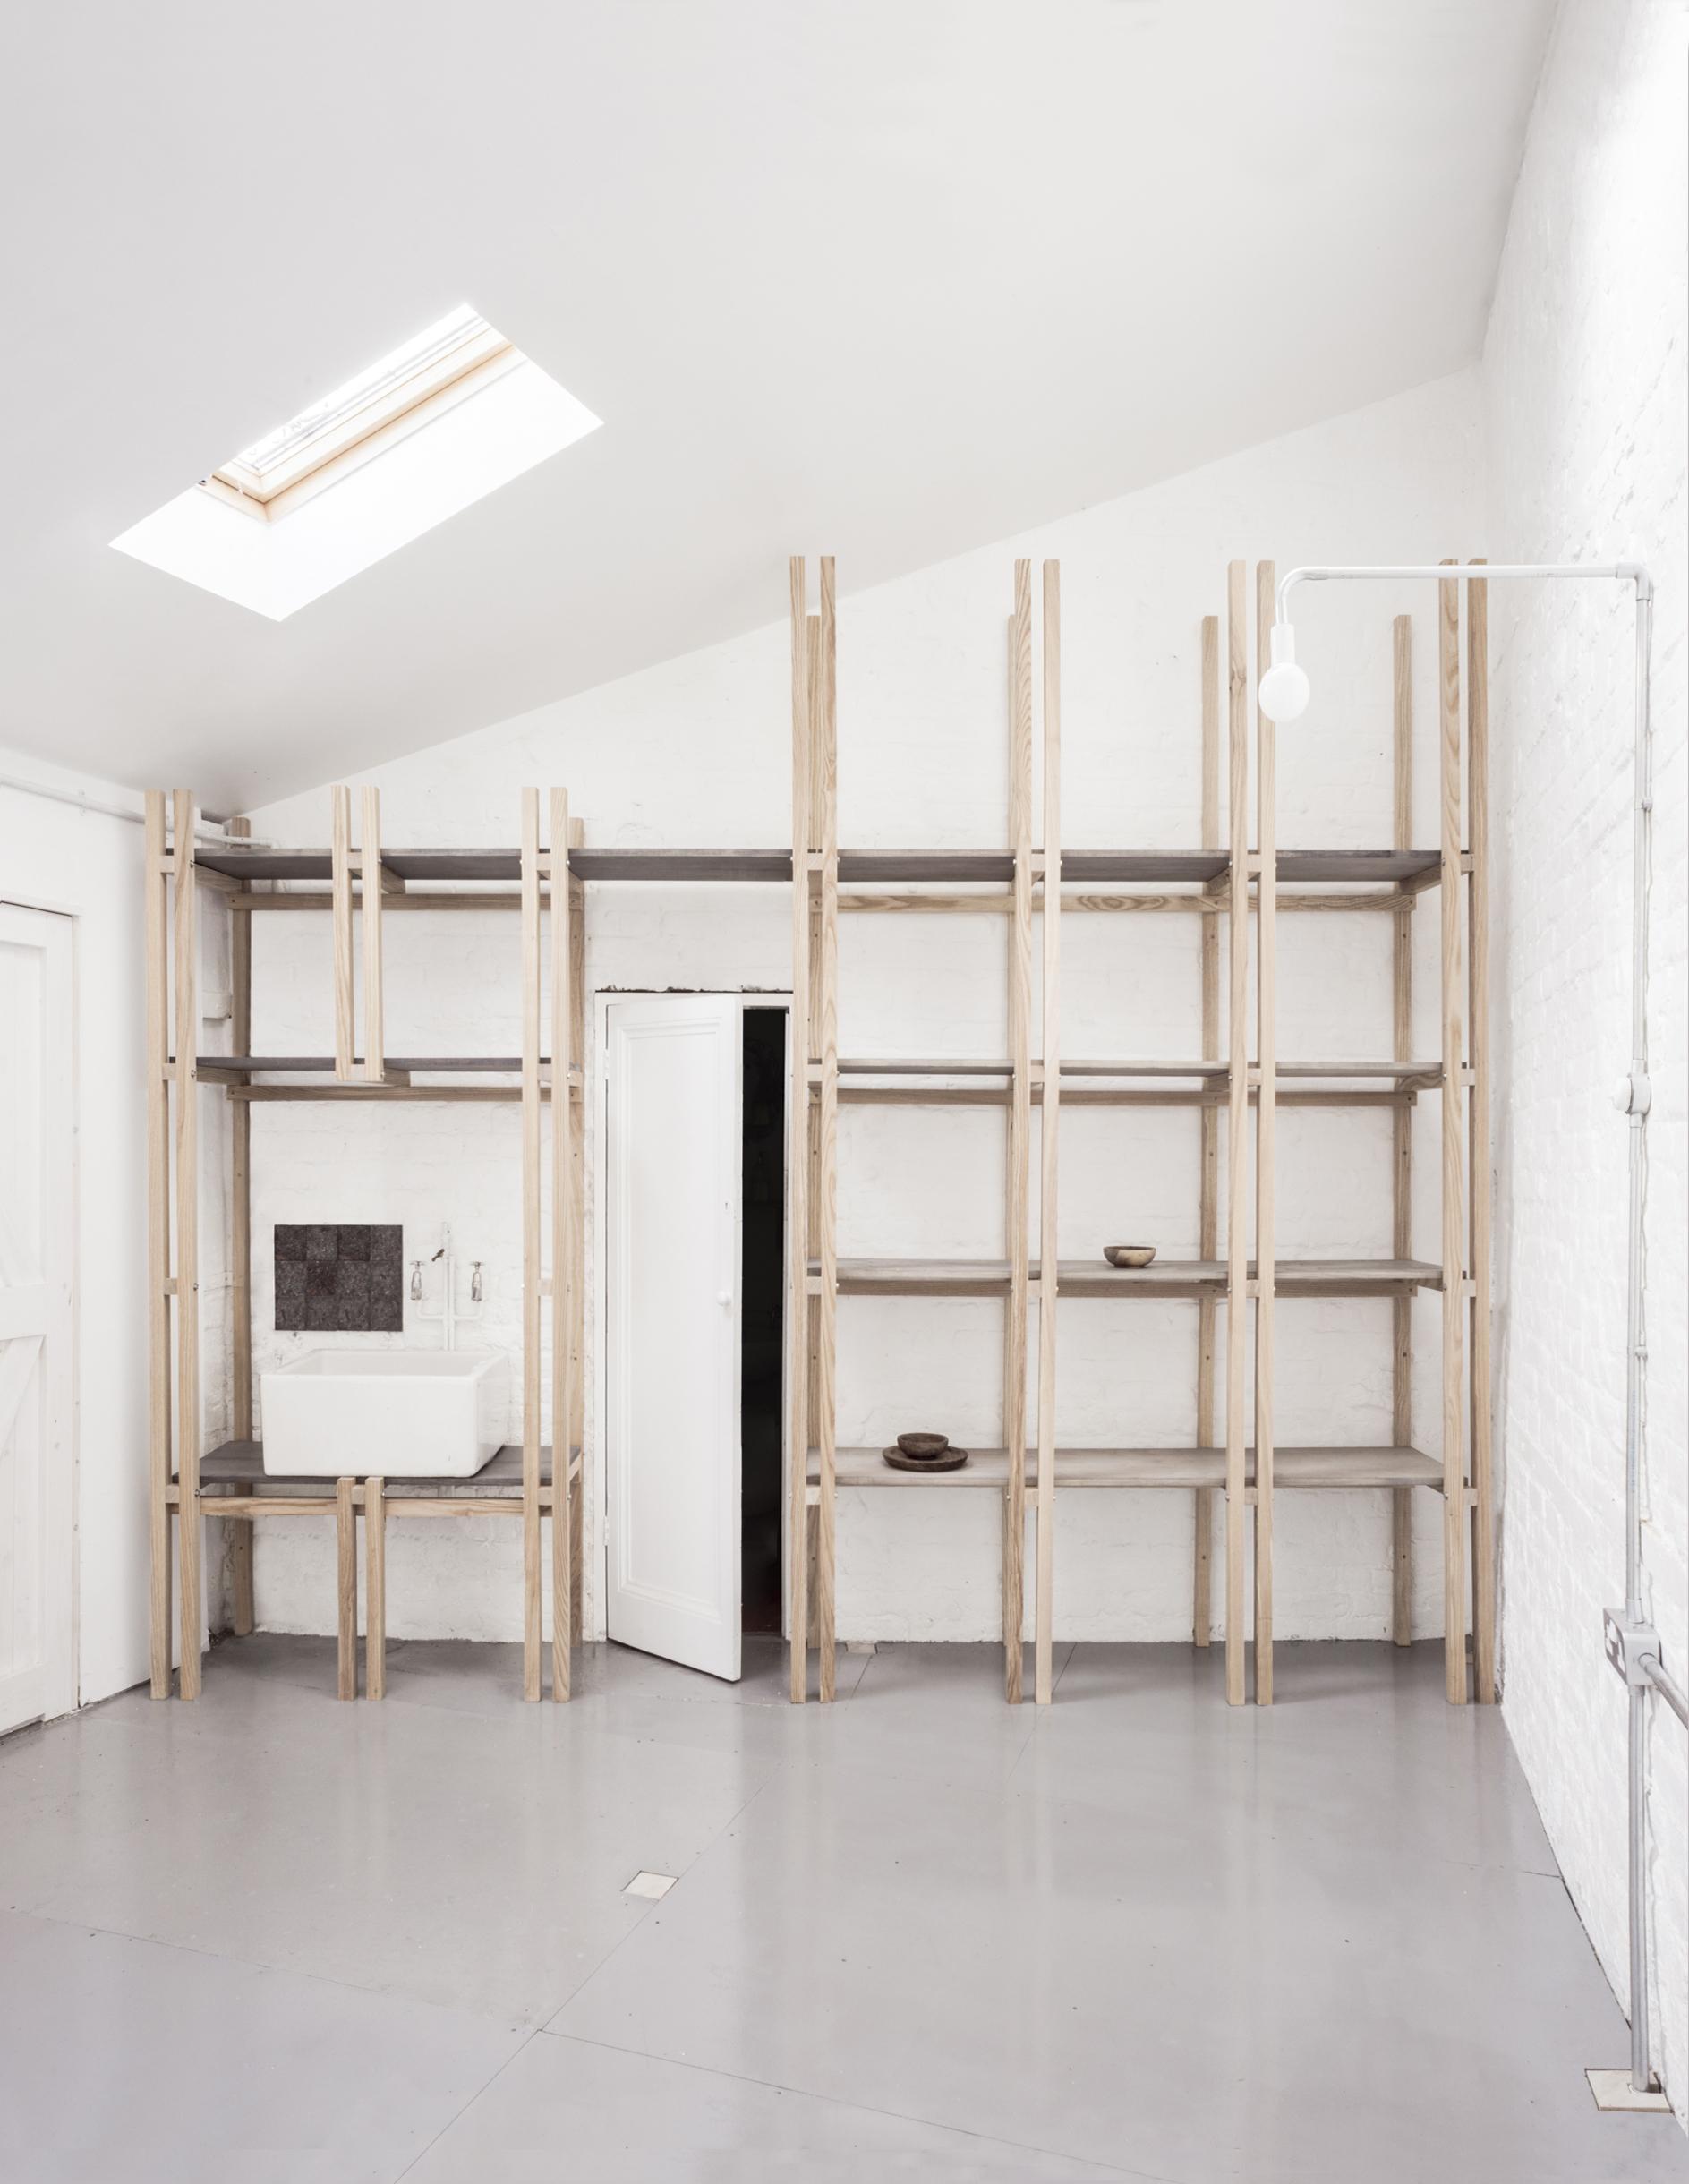 Newly designed artists studios by EBBA at Flat Time House photo: Lorenzo Zandri  (FLAT TIME HOUSE OPEN WEEKEND 2)